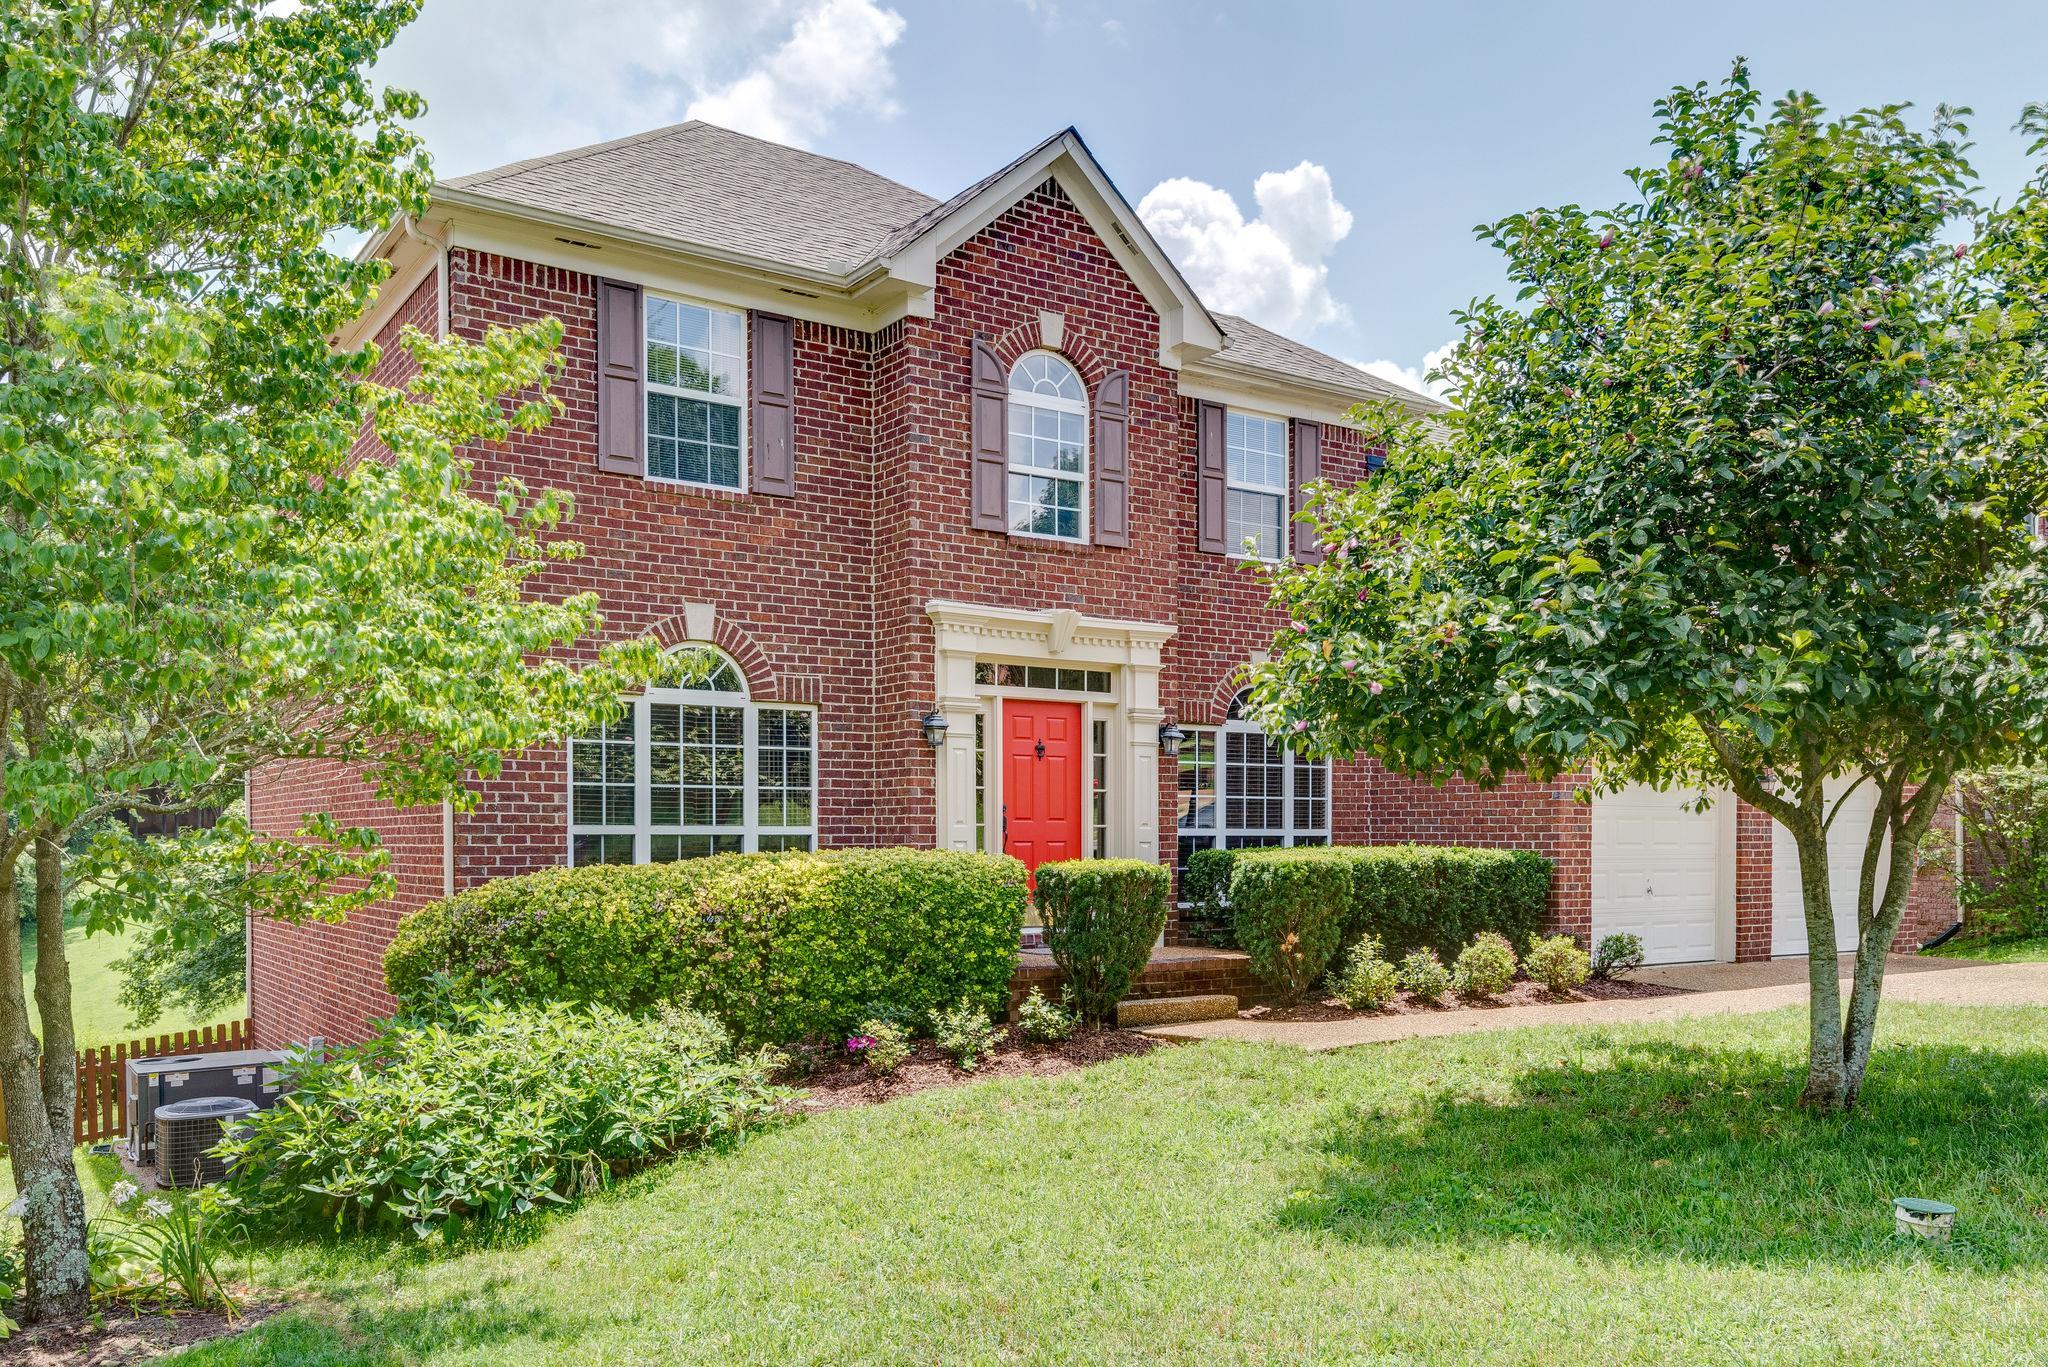 4908 Aviemore Dr, Nashville, TN 37220 - Nashville, TN real estate listing